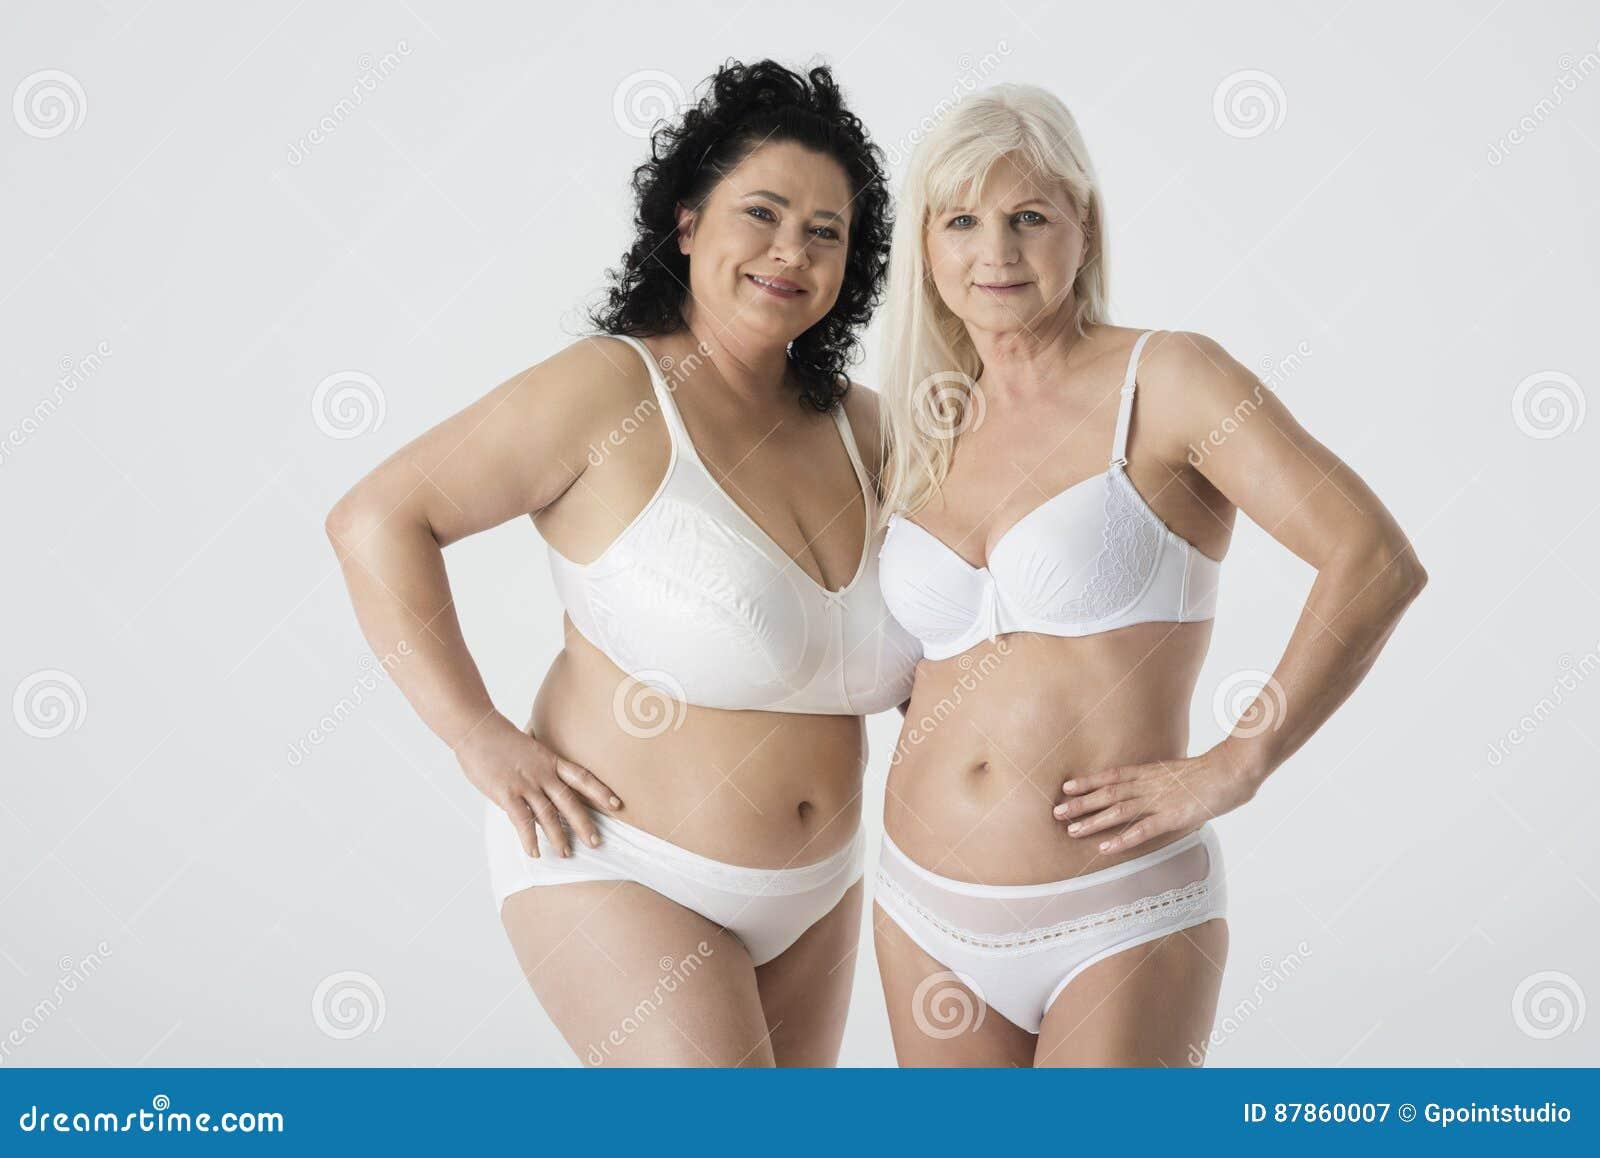 Two mature women in black lingerie